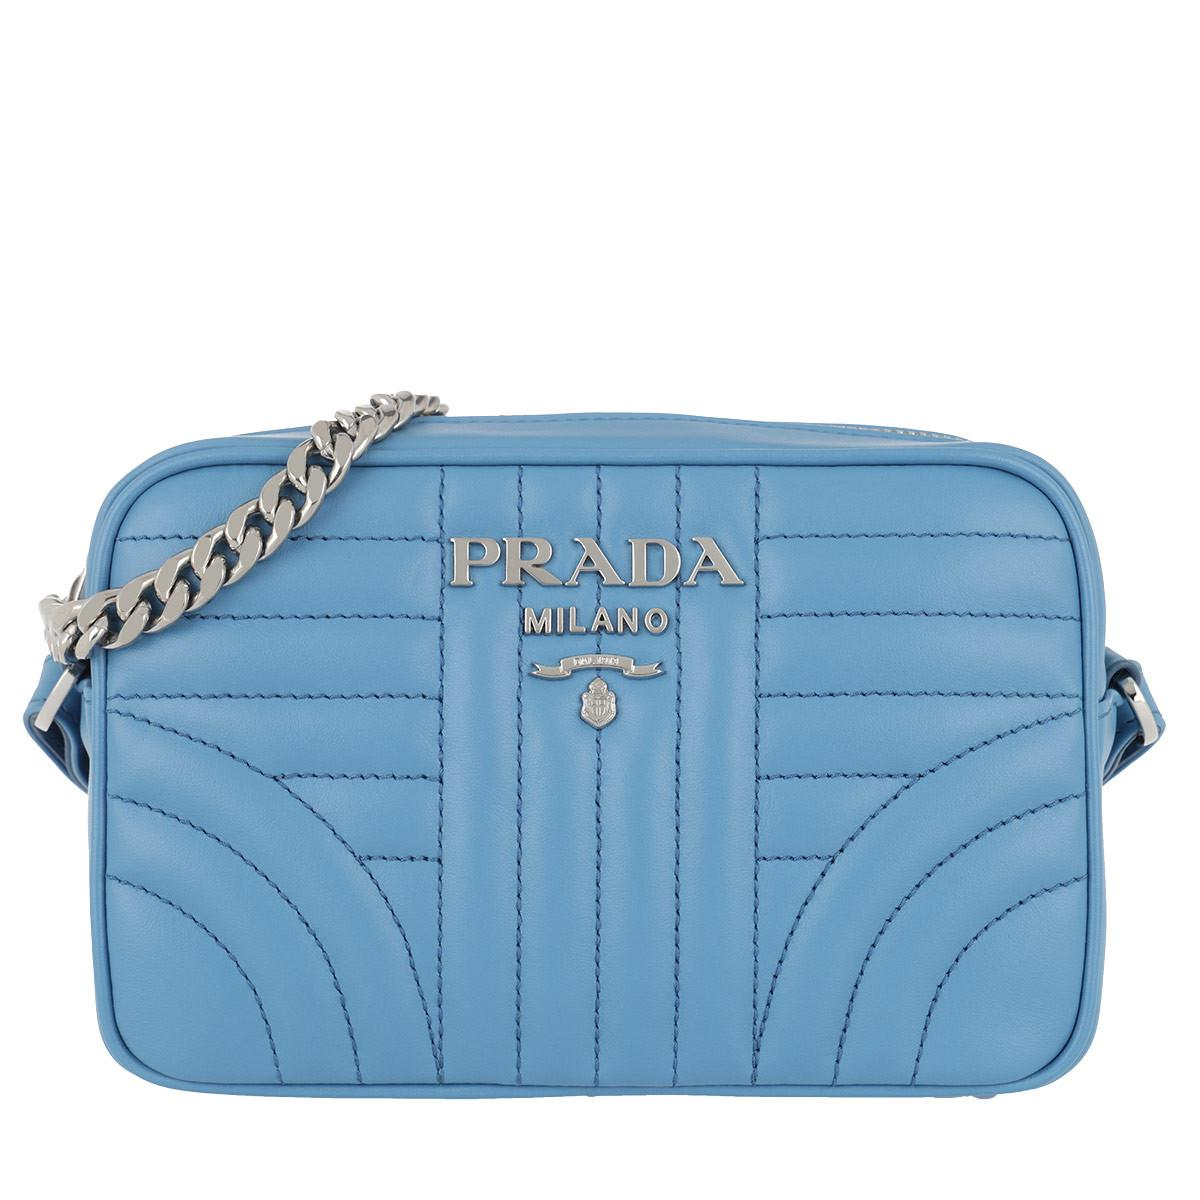 Cross Body Bags - iPhone Case Saffiano Logo Lettering Mare - blue - Cross Body Bags for ladies Prada dlZLJCw